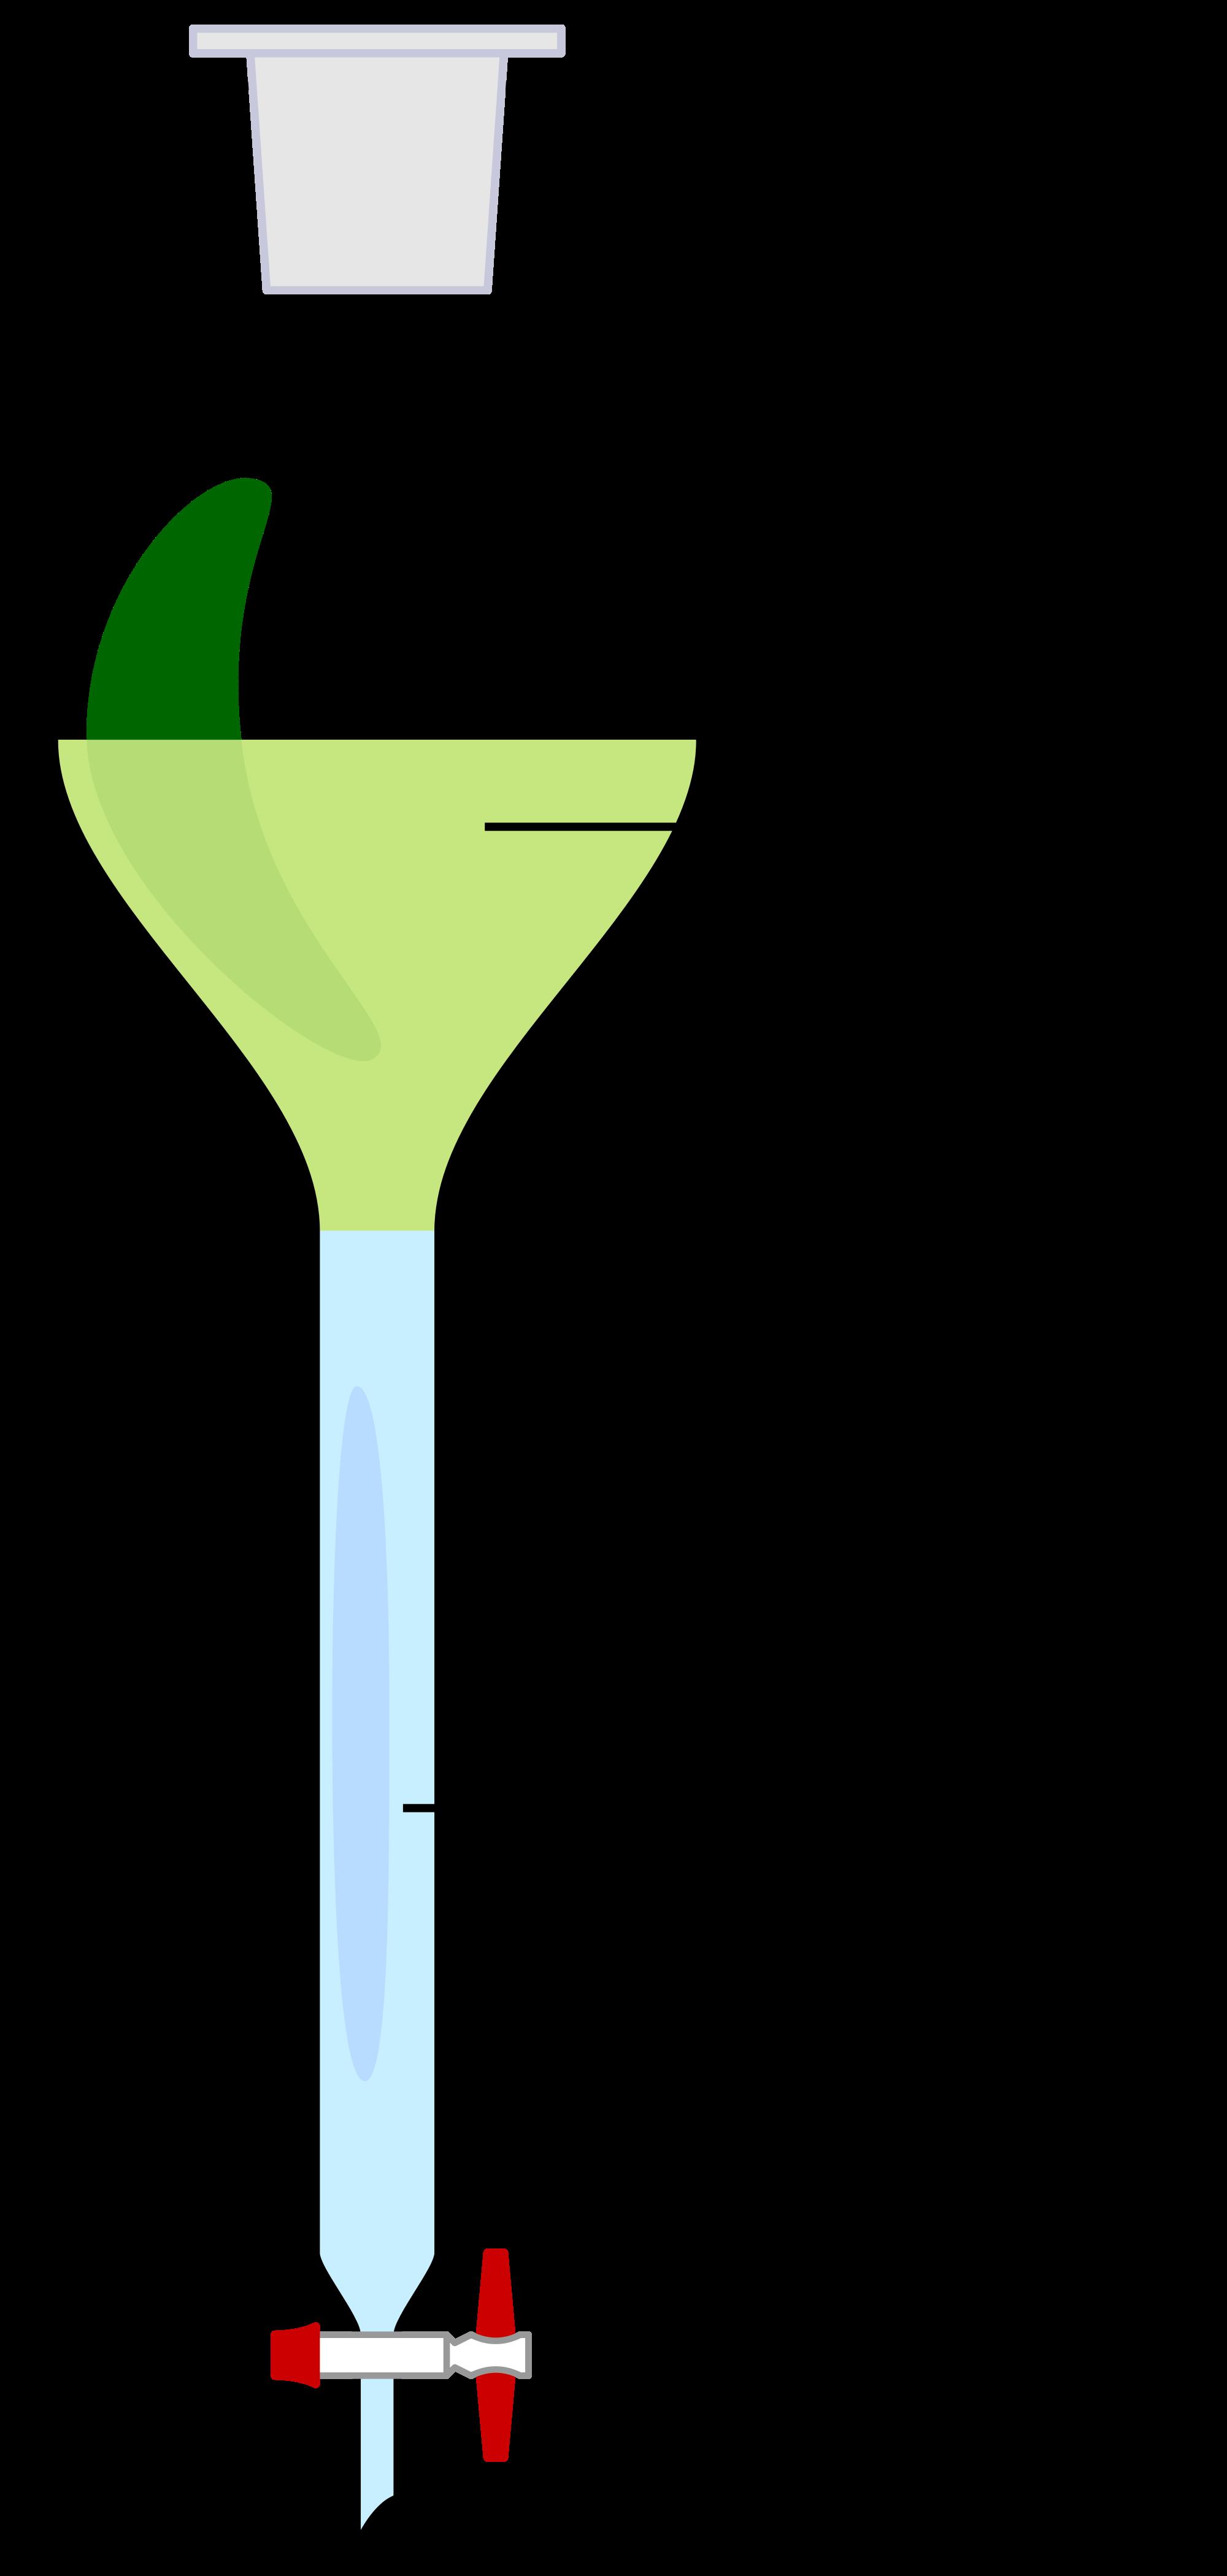 File:Separatory funnel.